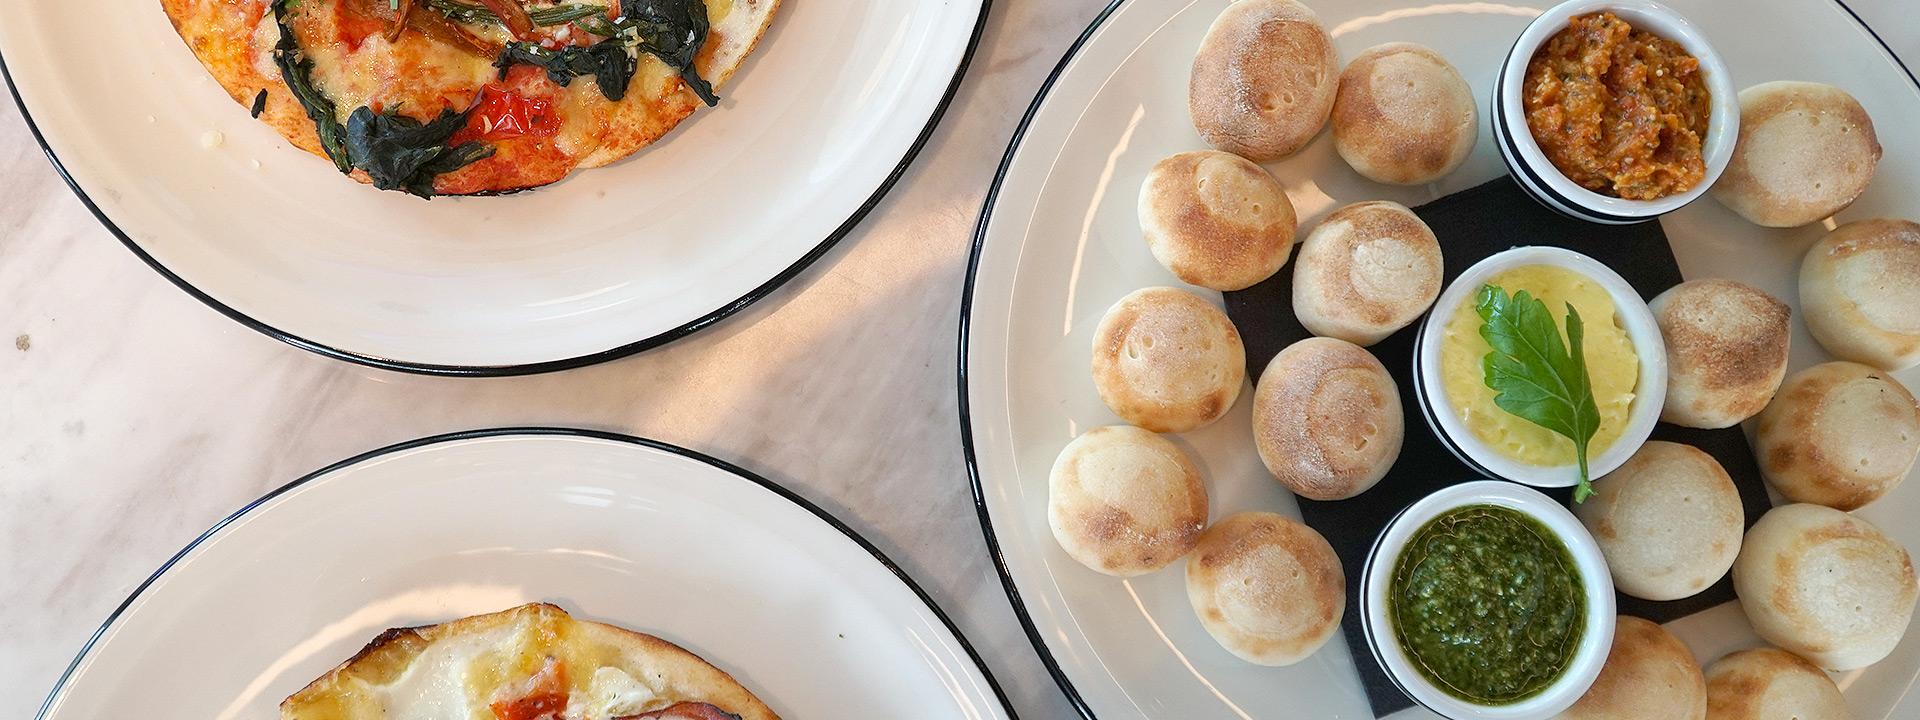 PizzaExpress Doughballs Singapore